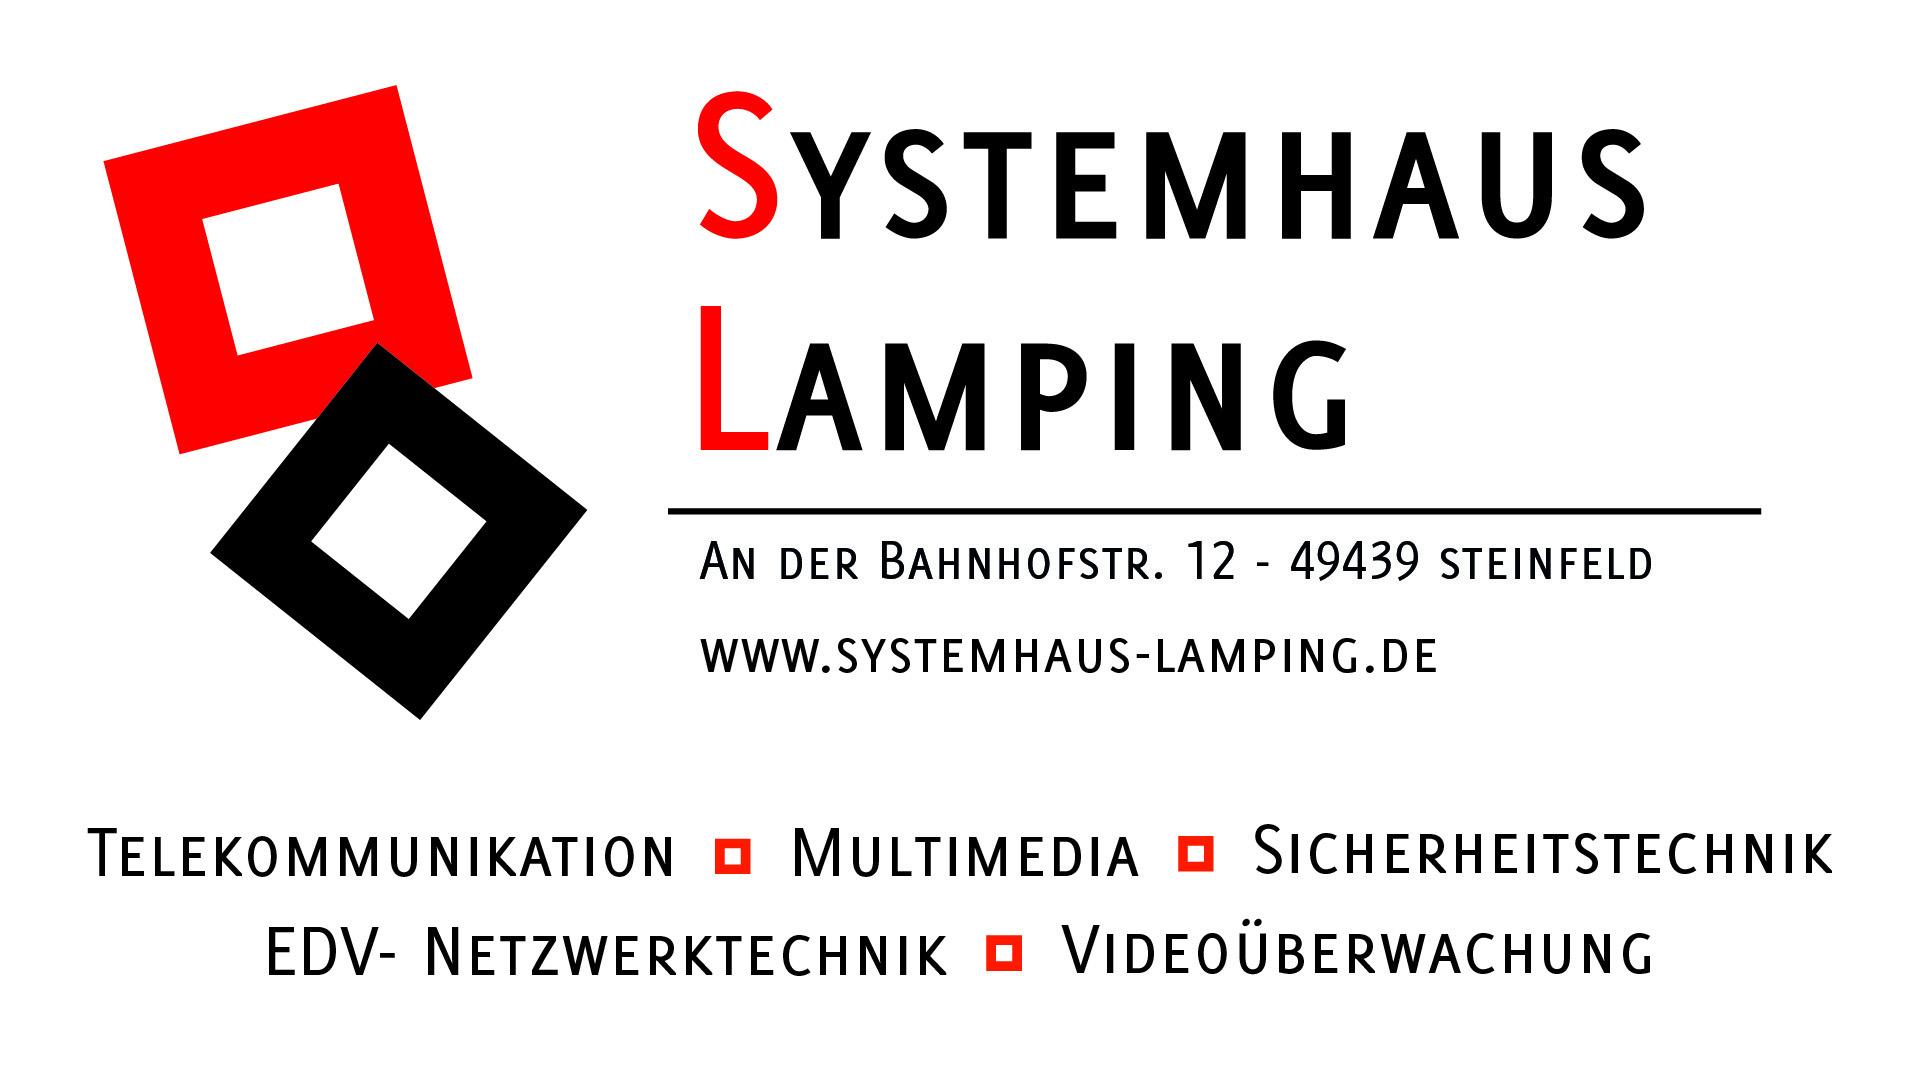 Systemhaus Lamping aus Steinfeld